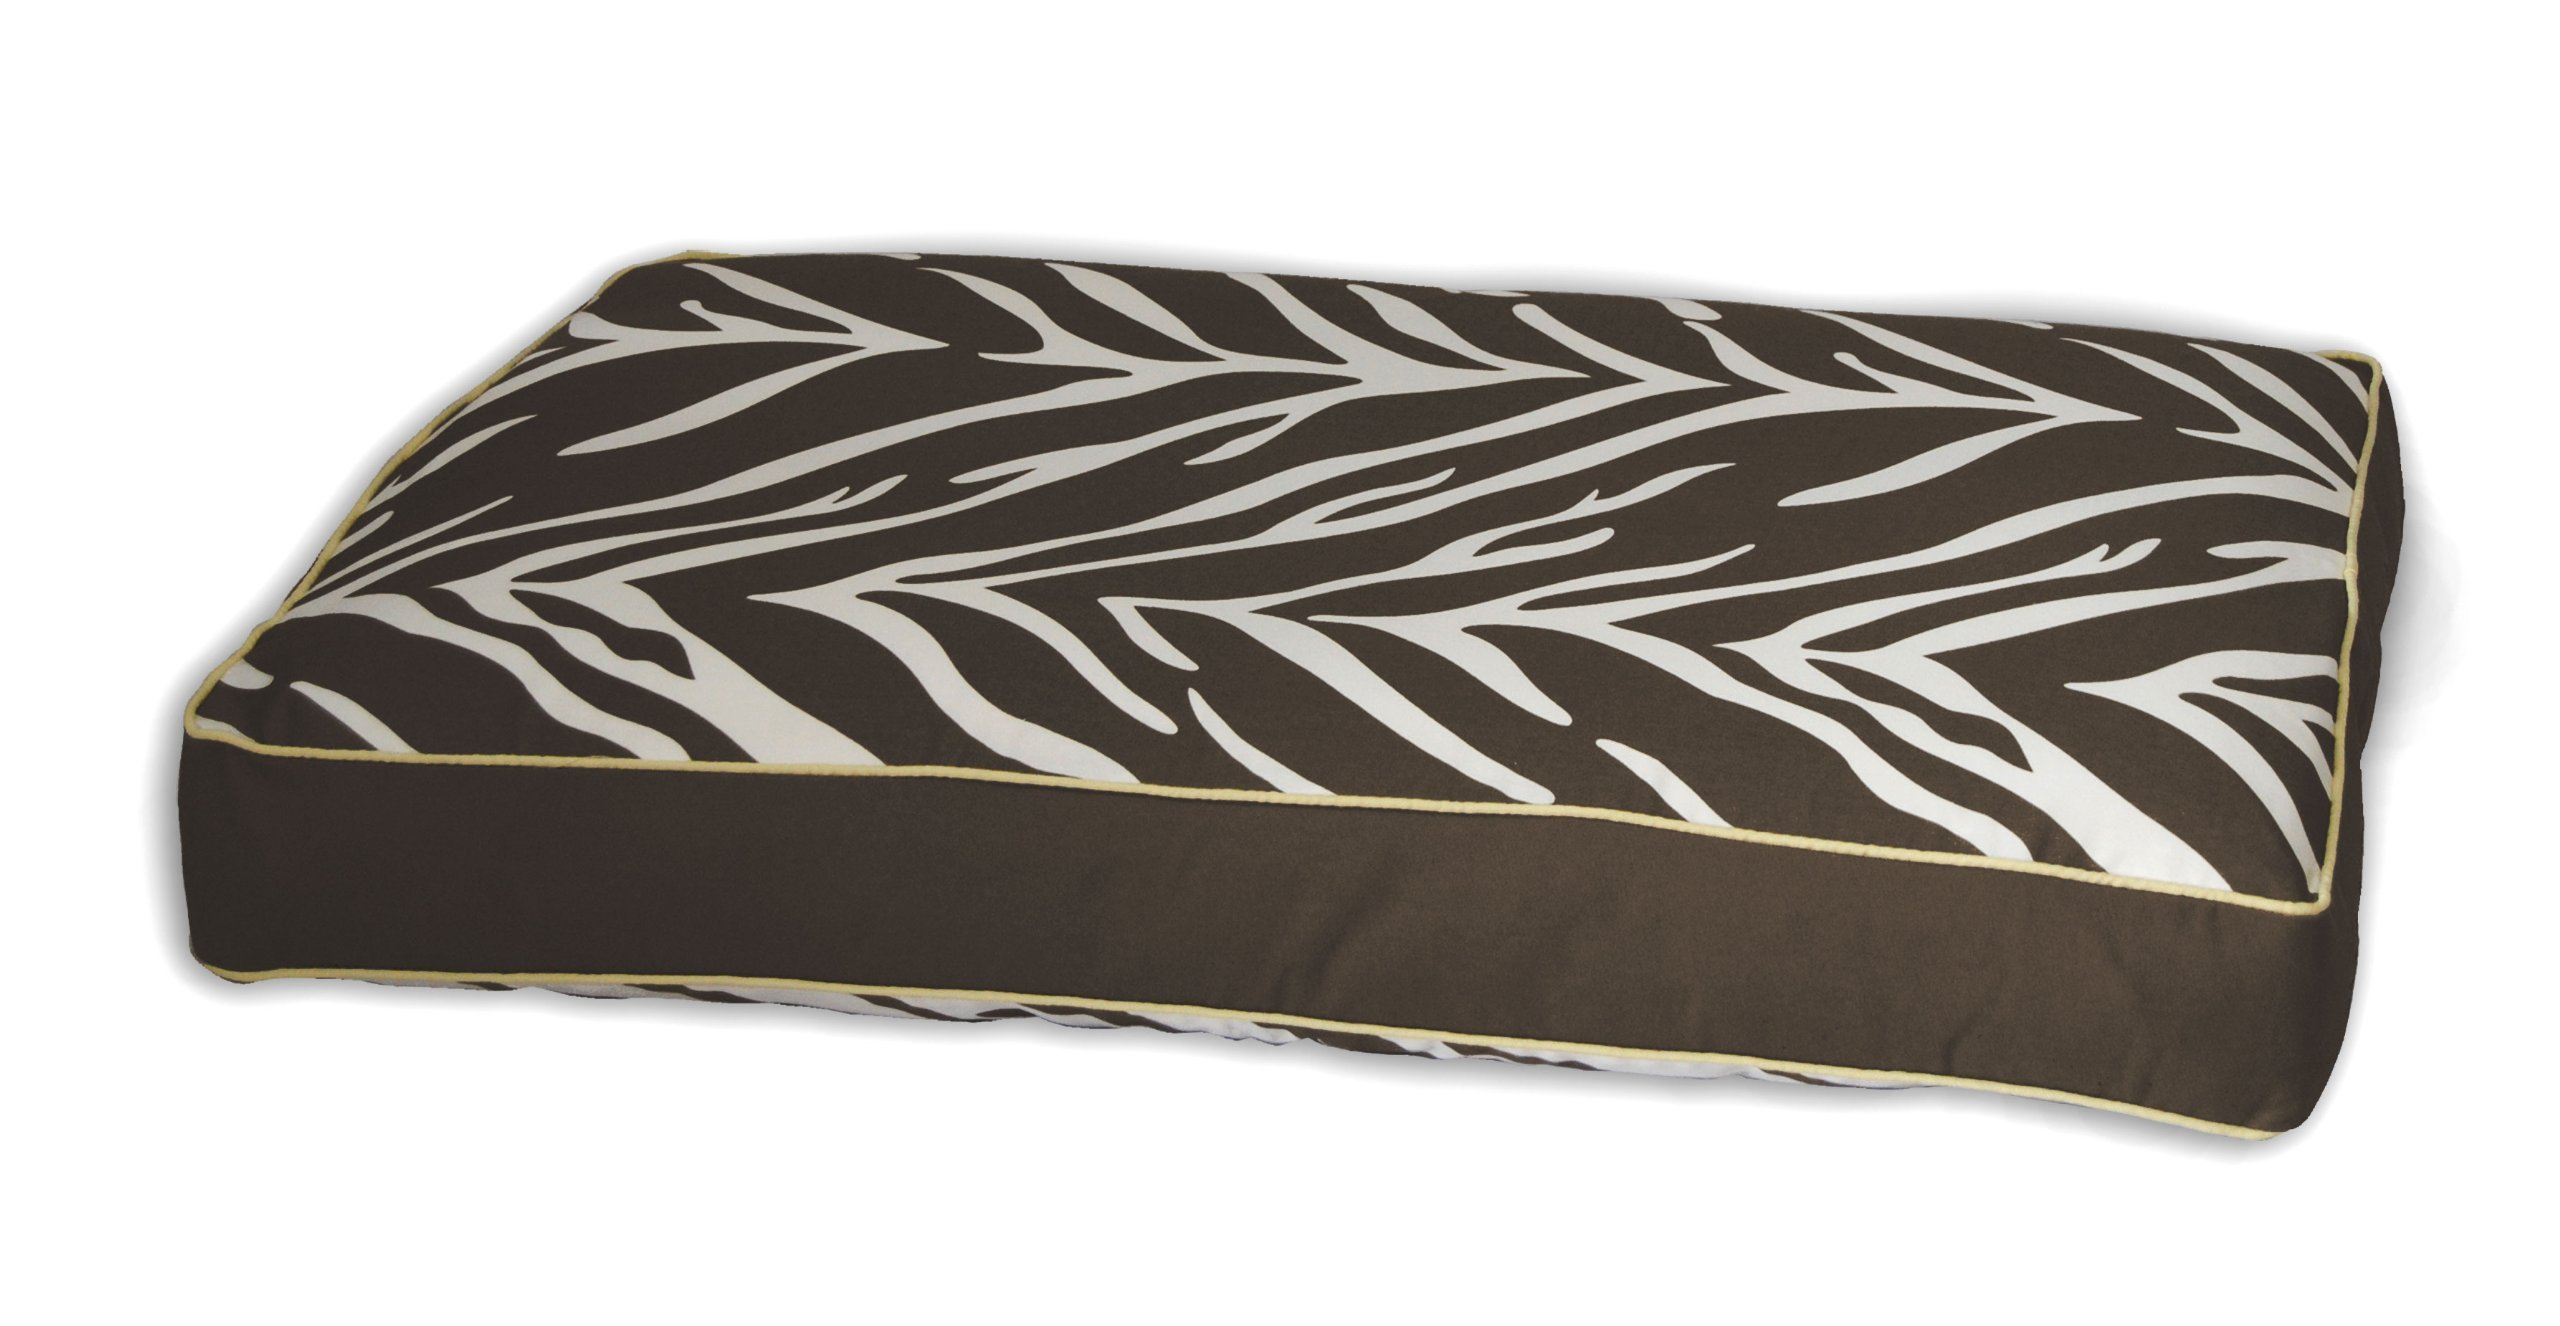 Zebra Memory Foam Topper Pillow Pet Bed Size: Medium (36'' H x 27'' W), Color: Brown